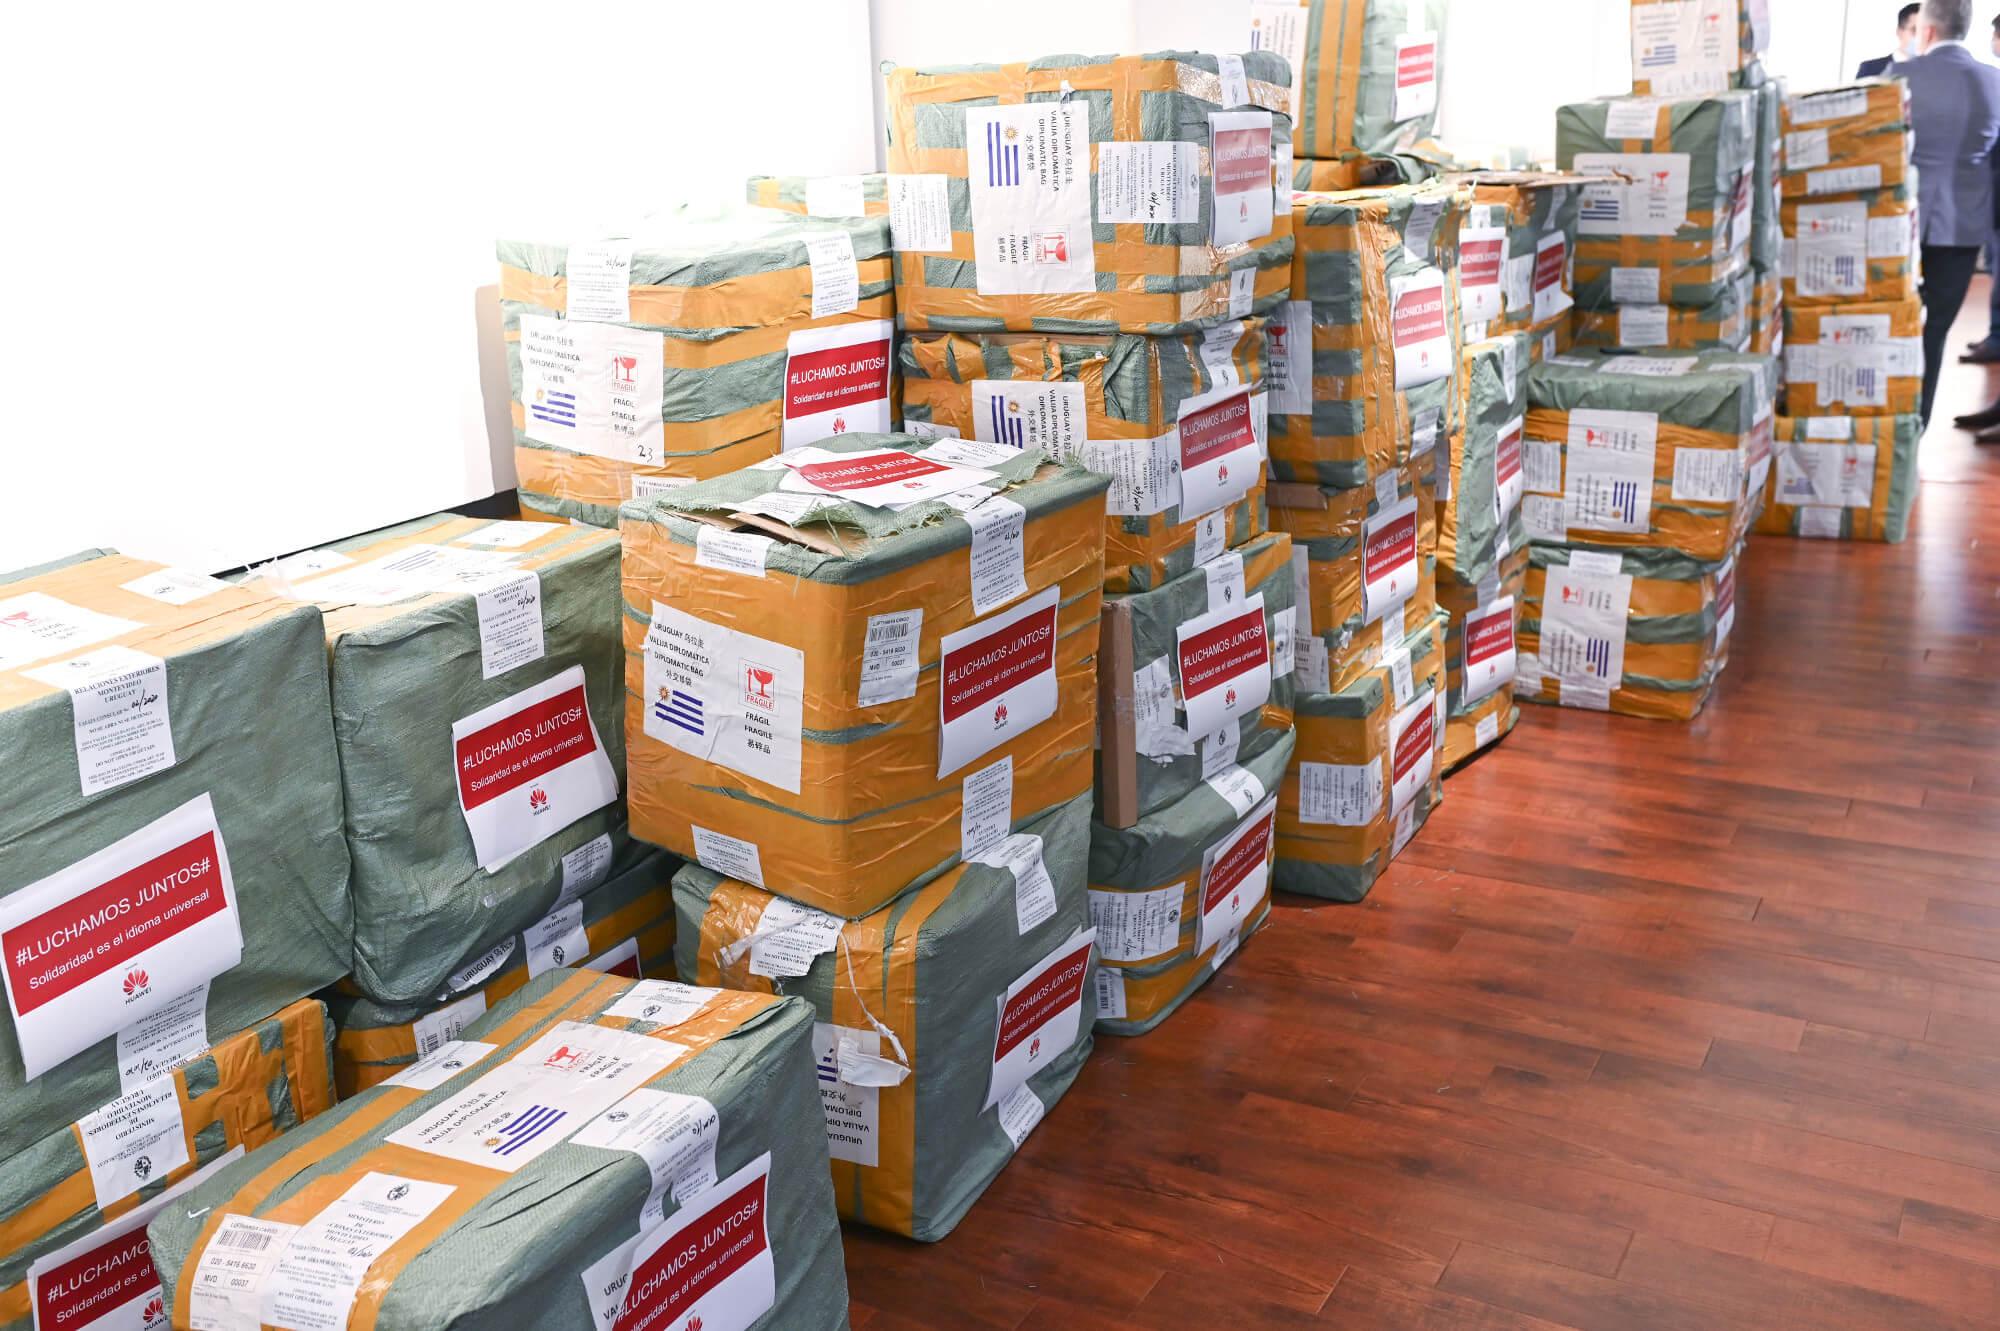 huawei donacion a uruguay coronavirus